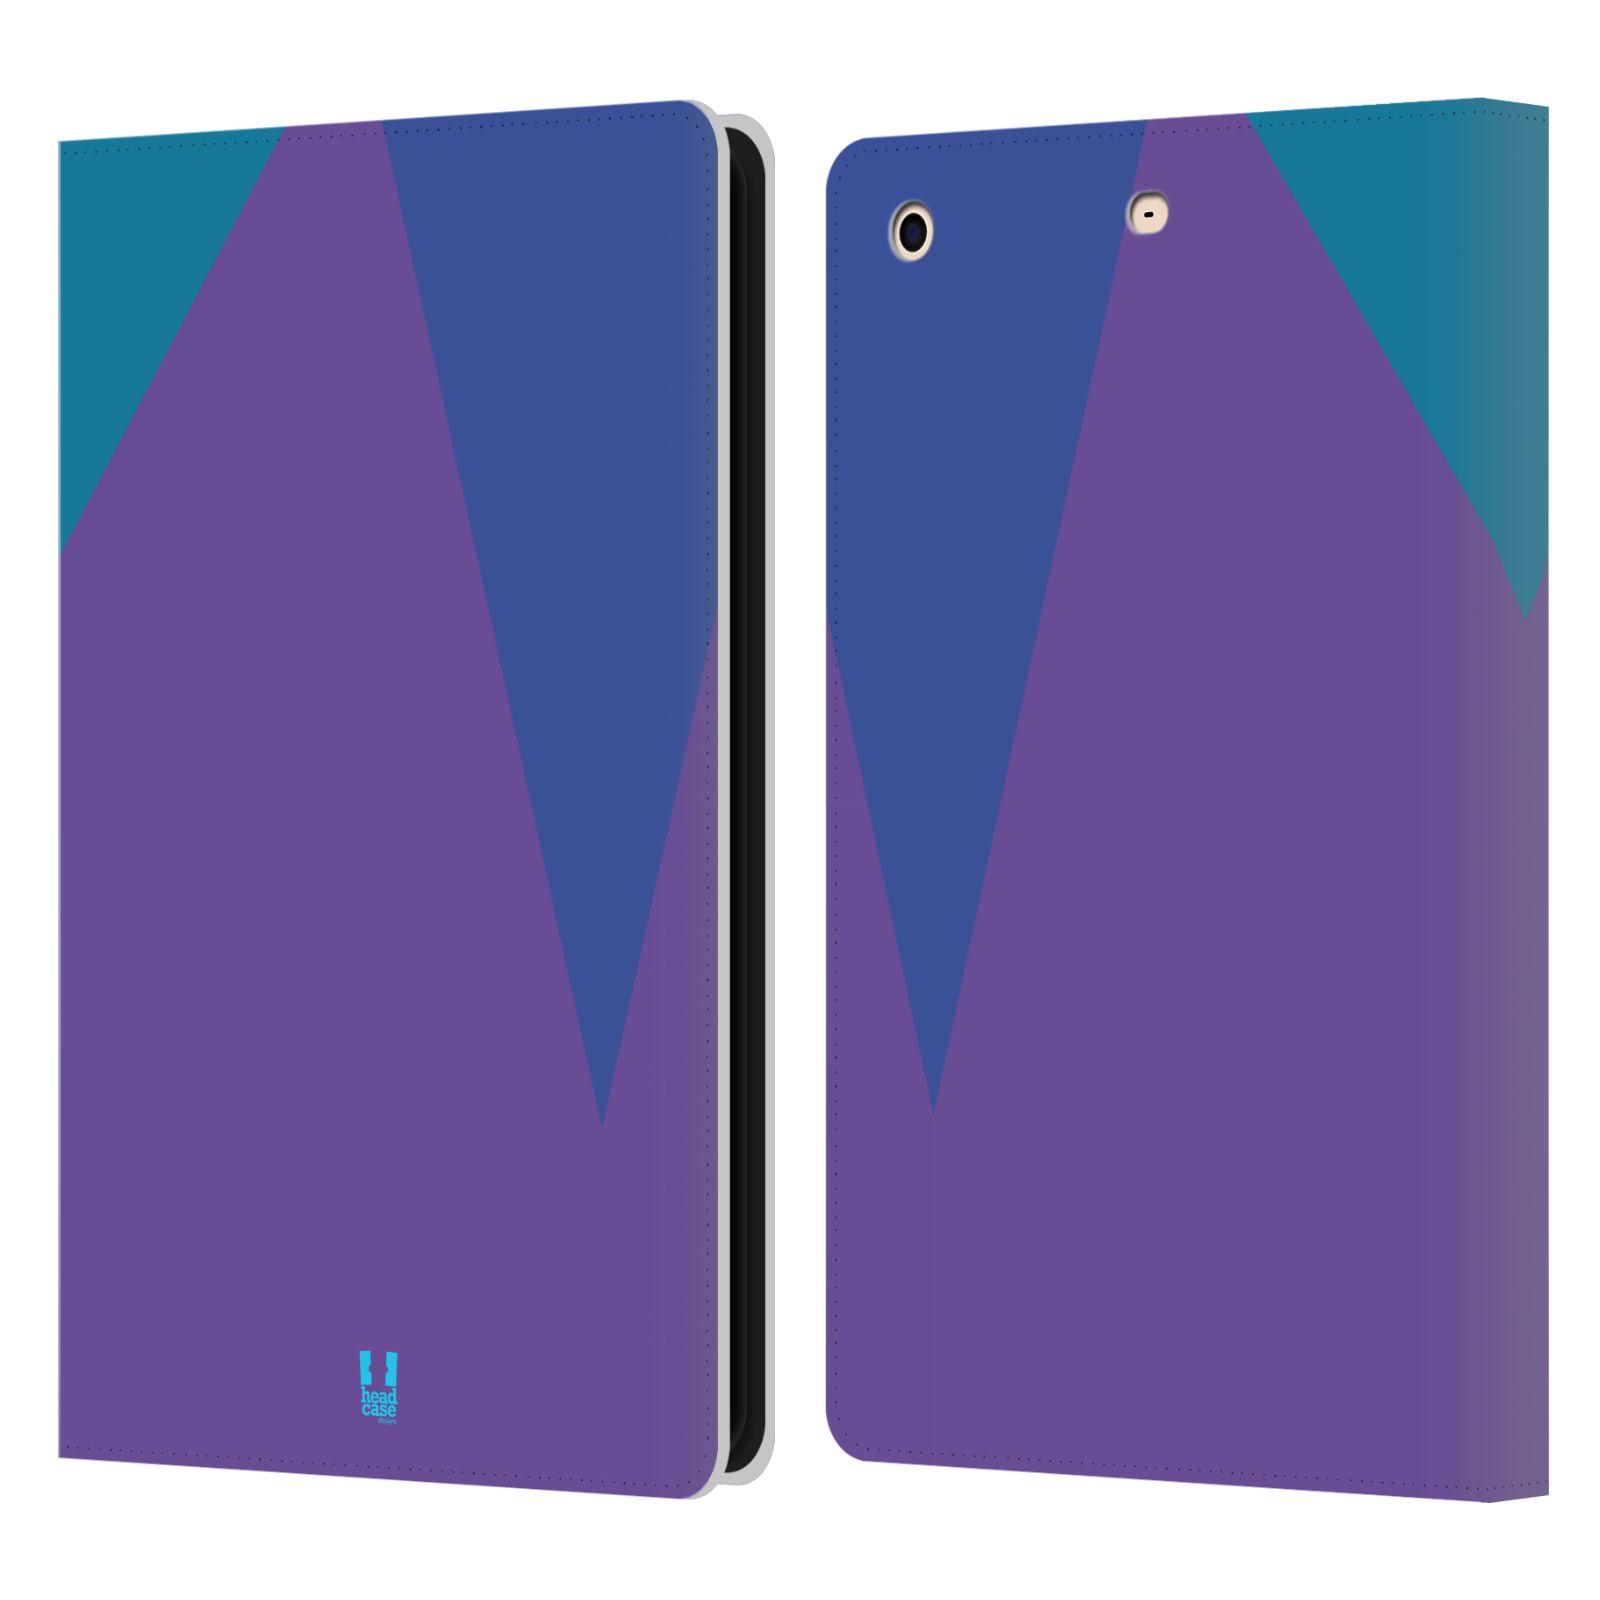 HEAD CASE Flipové pouzdro pro tablet Apple iPad mini barevné tvary fialová feminine